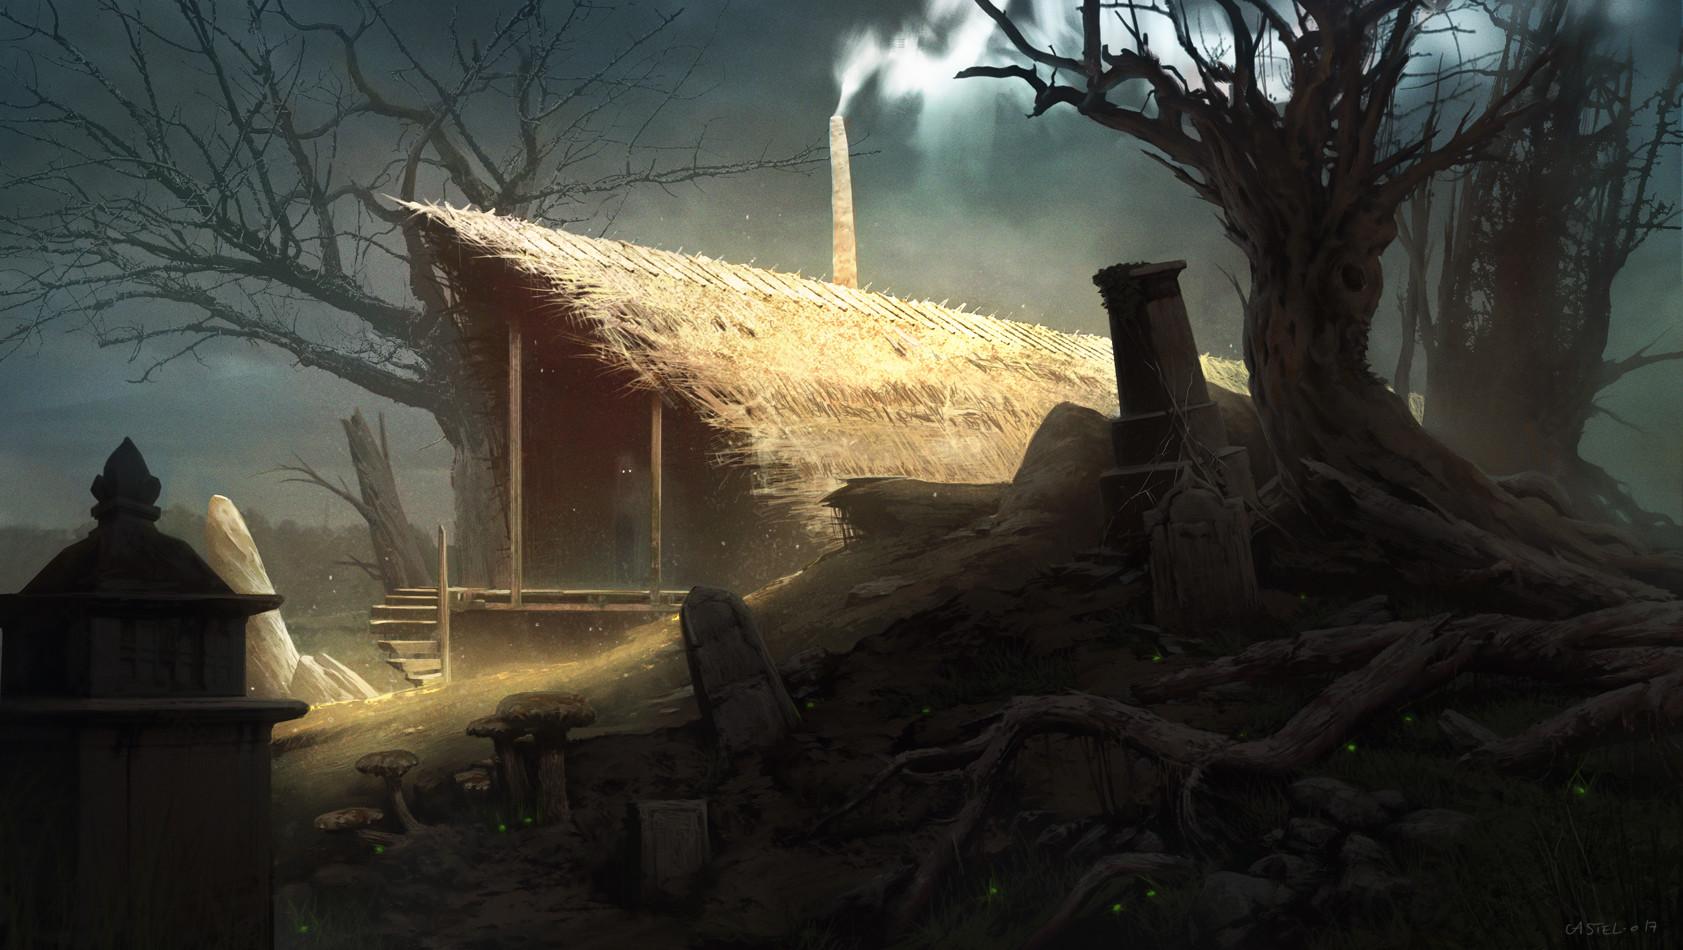 Quentin castel witch s lair artstation